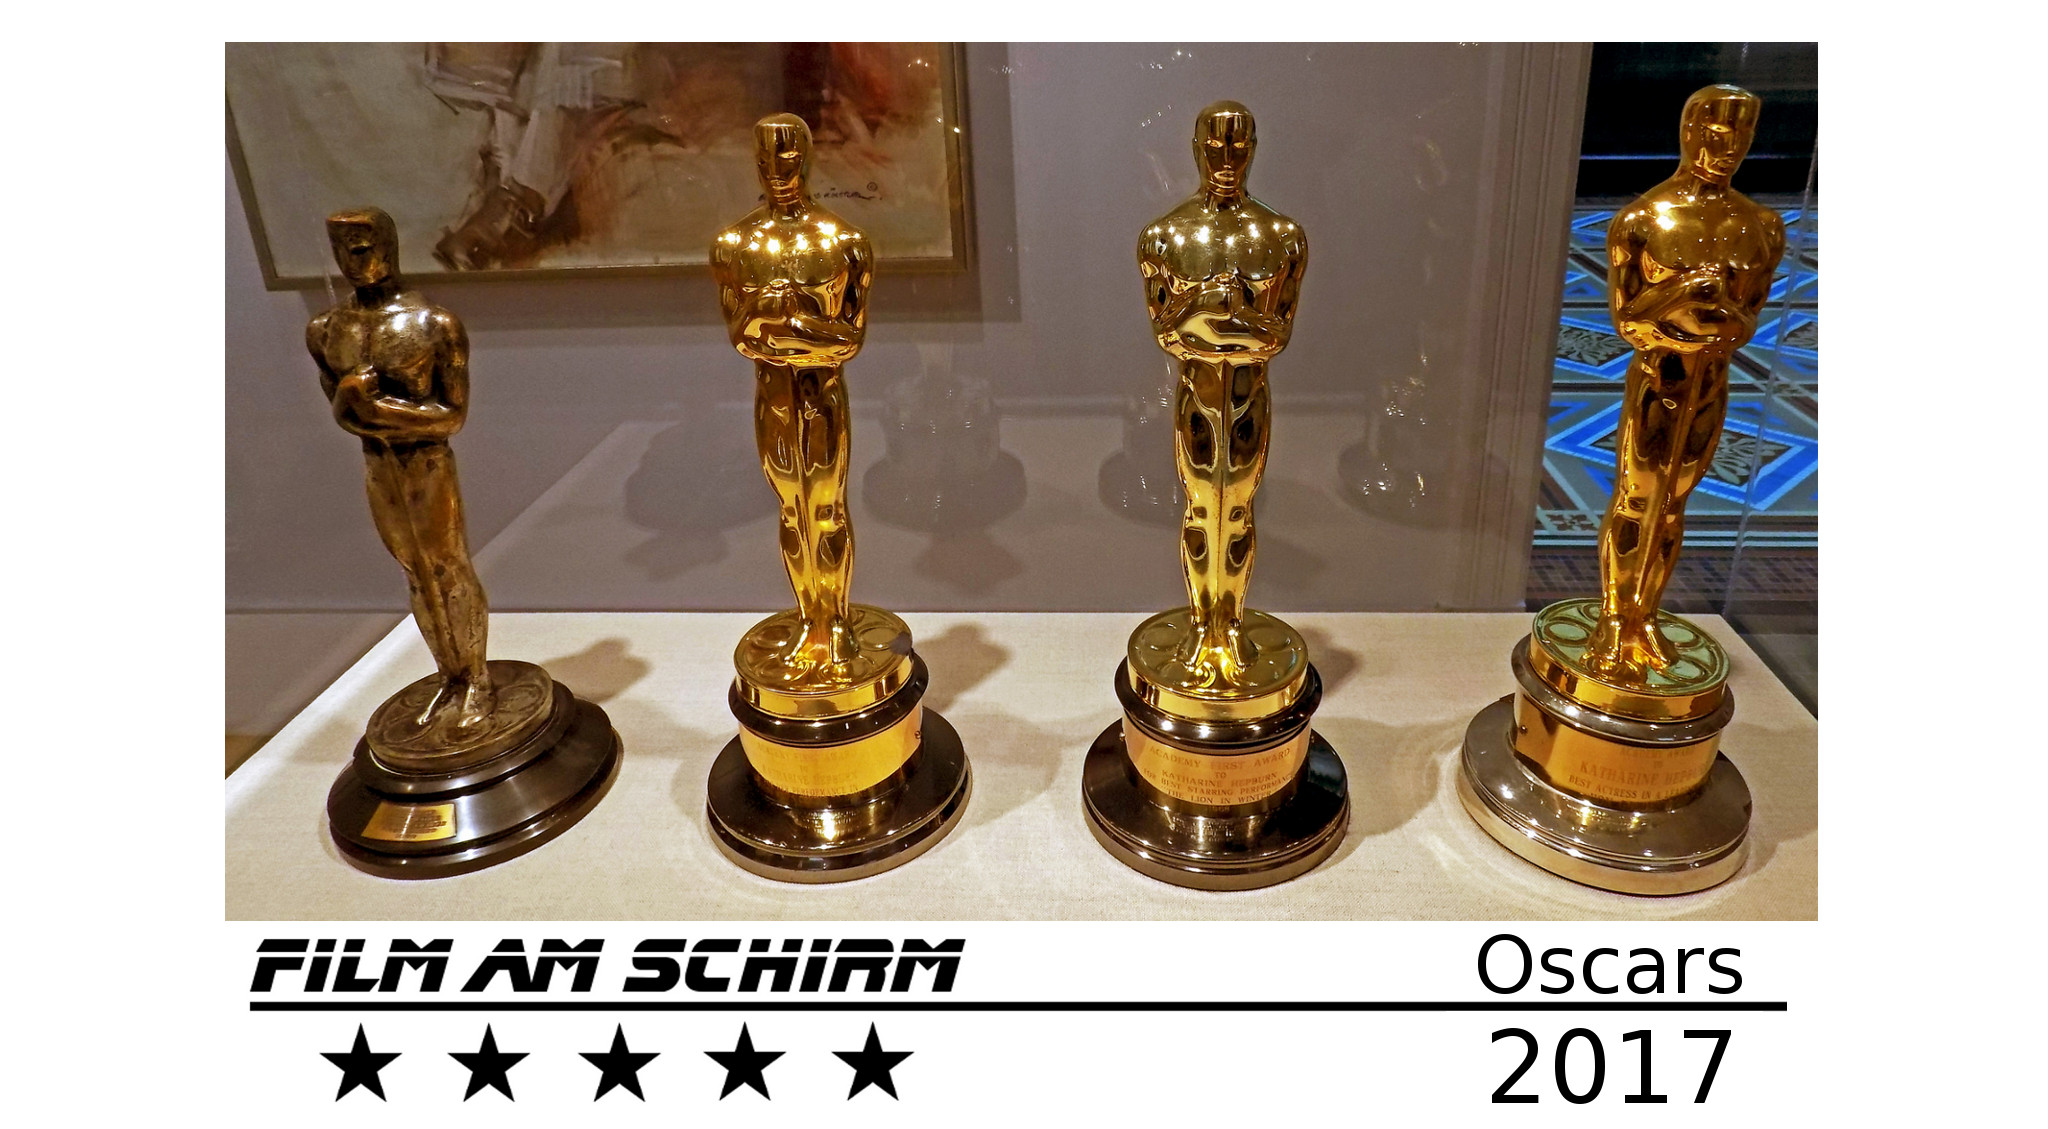 Film-am-Schirm-Oscars2017